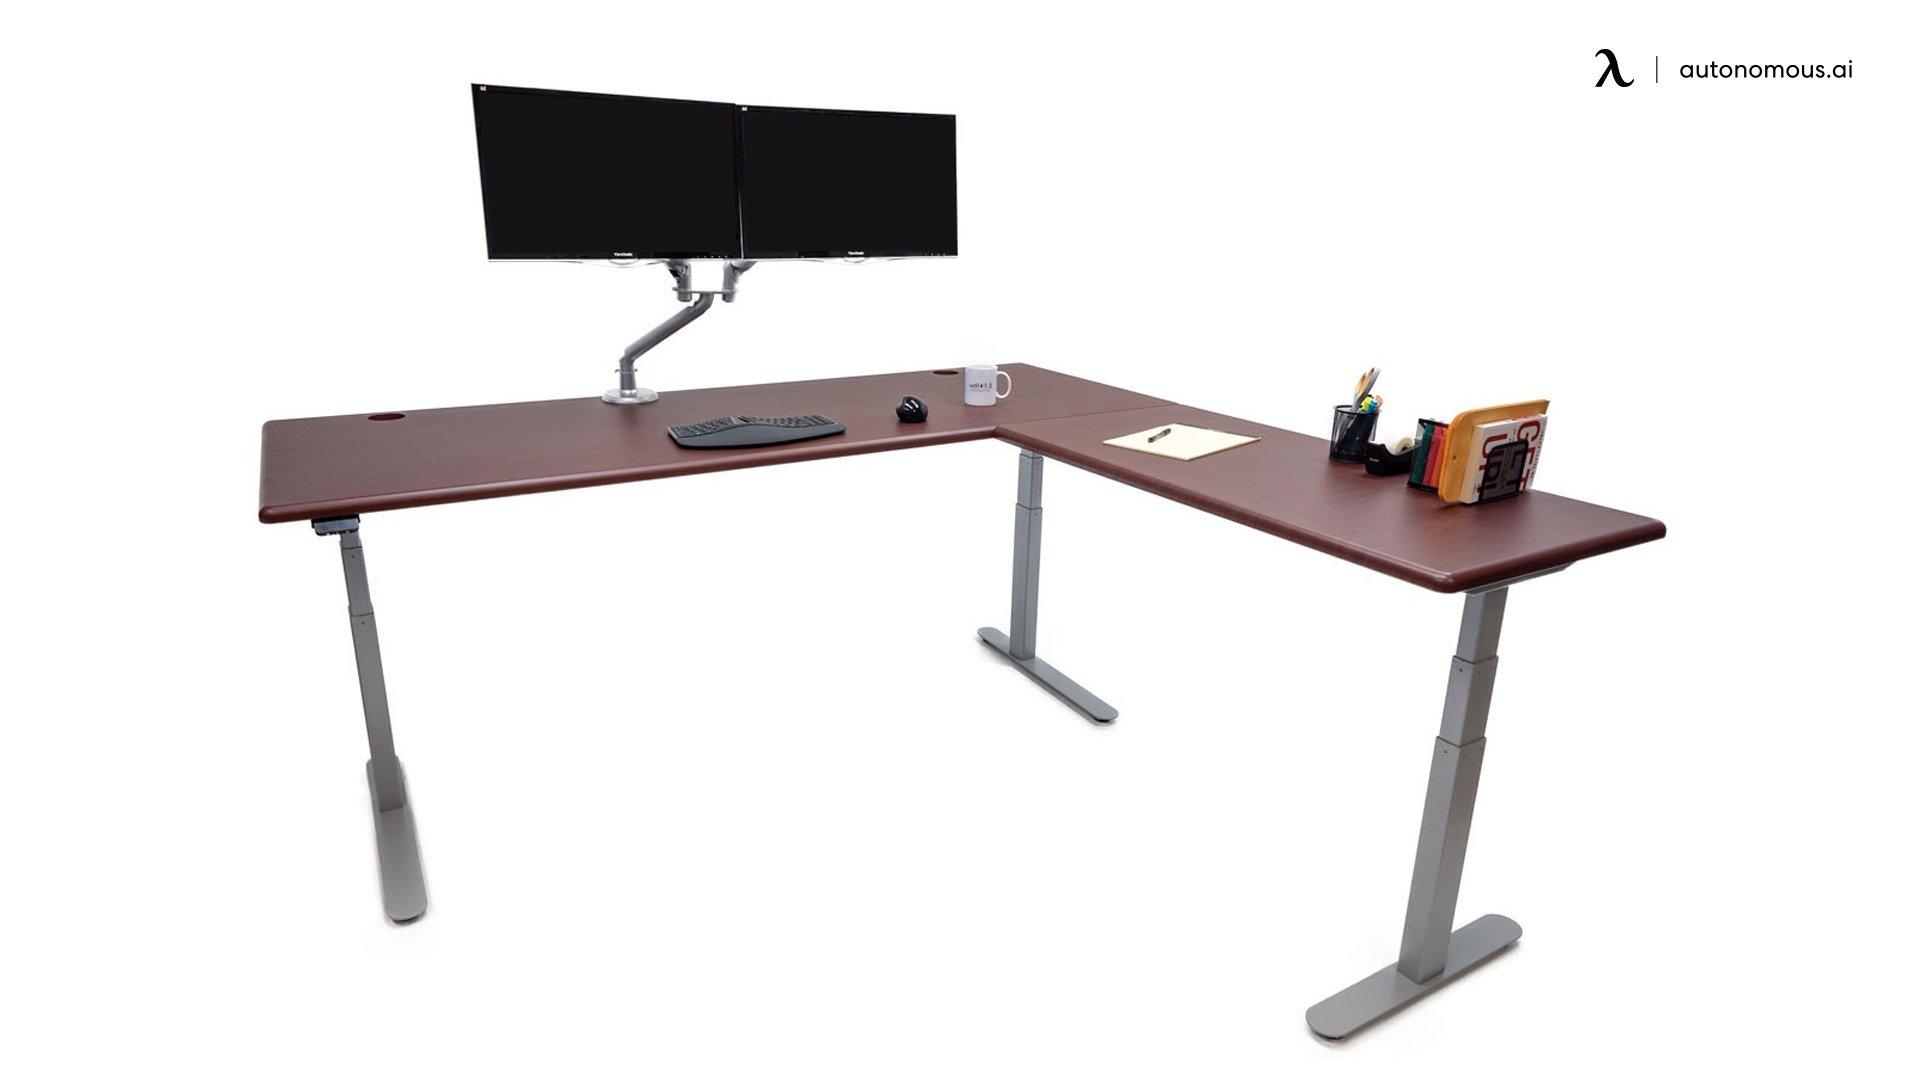 Give the iMovR Lander L Desk a try